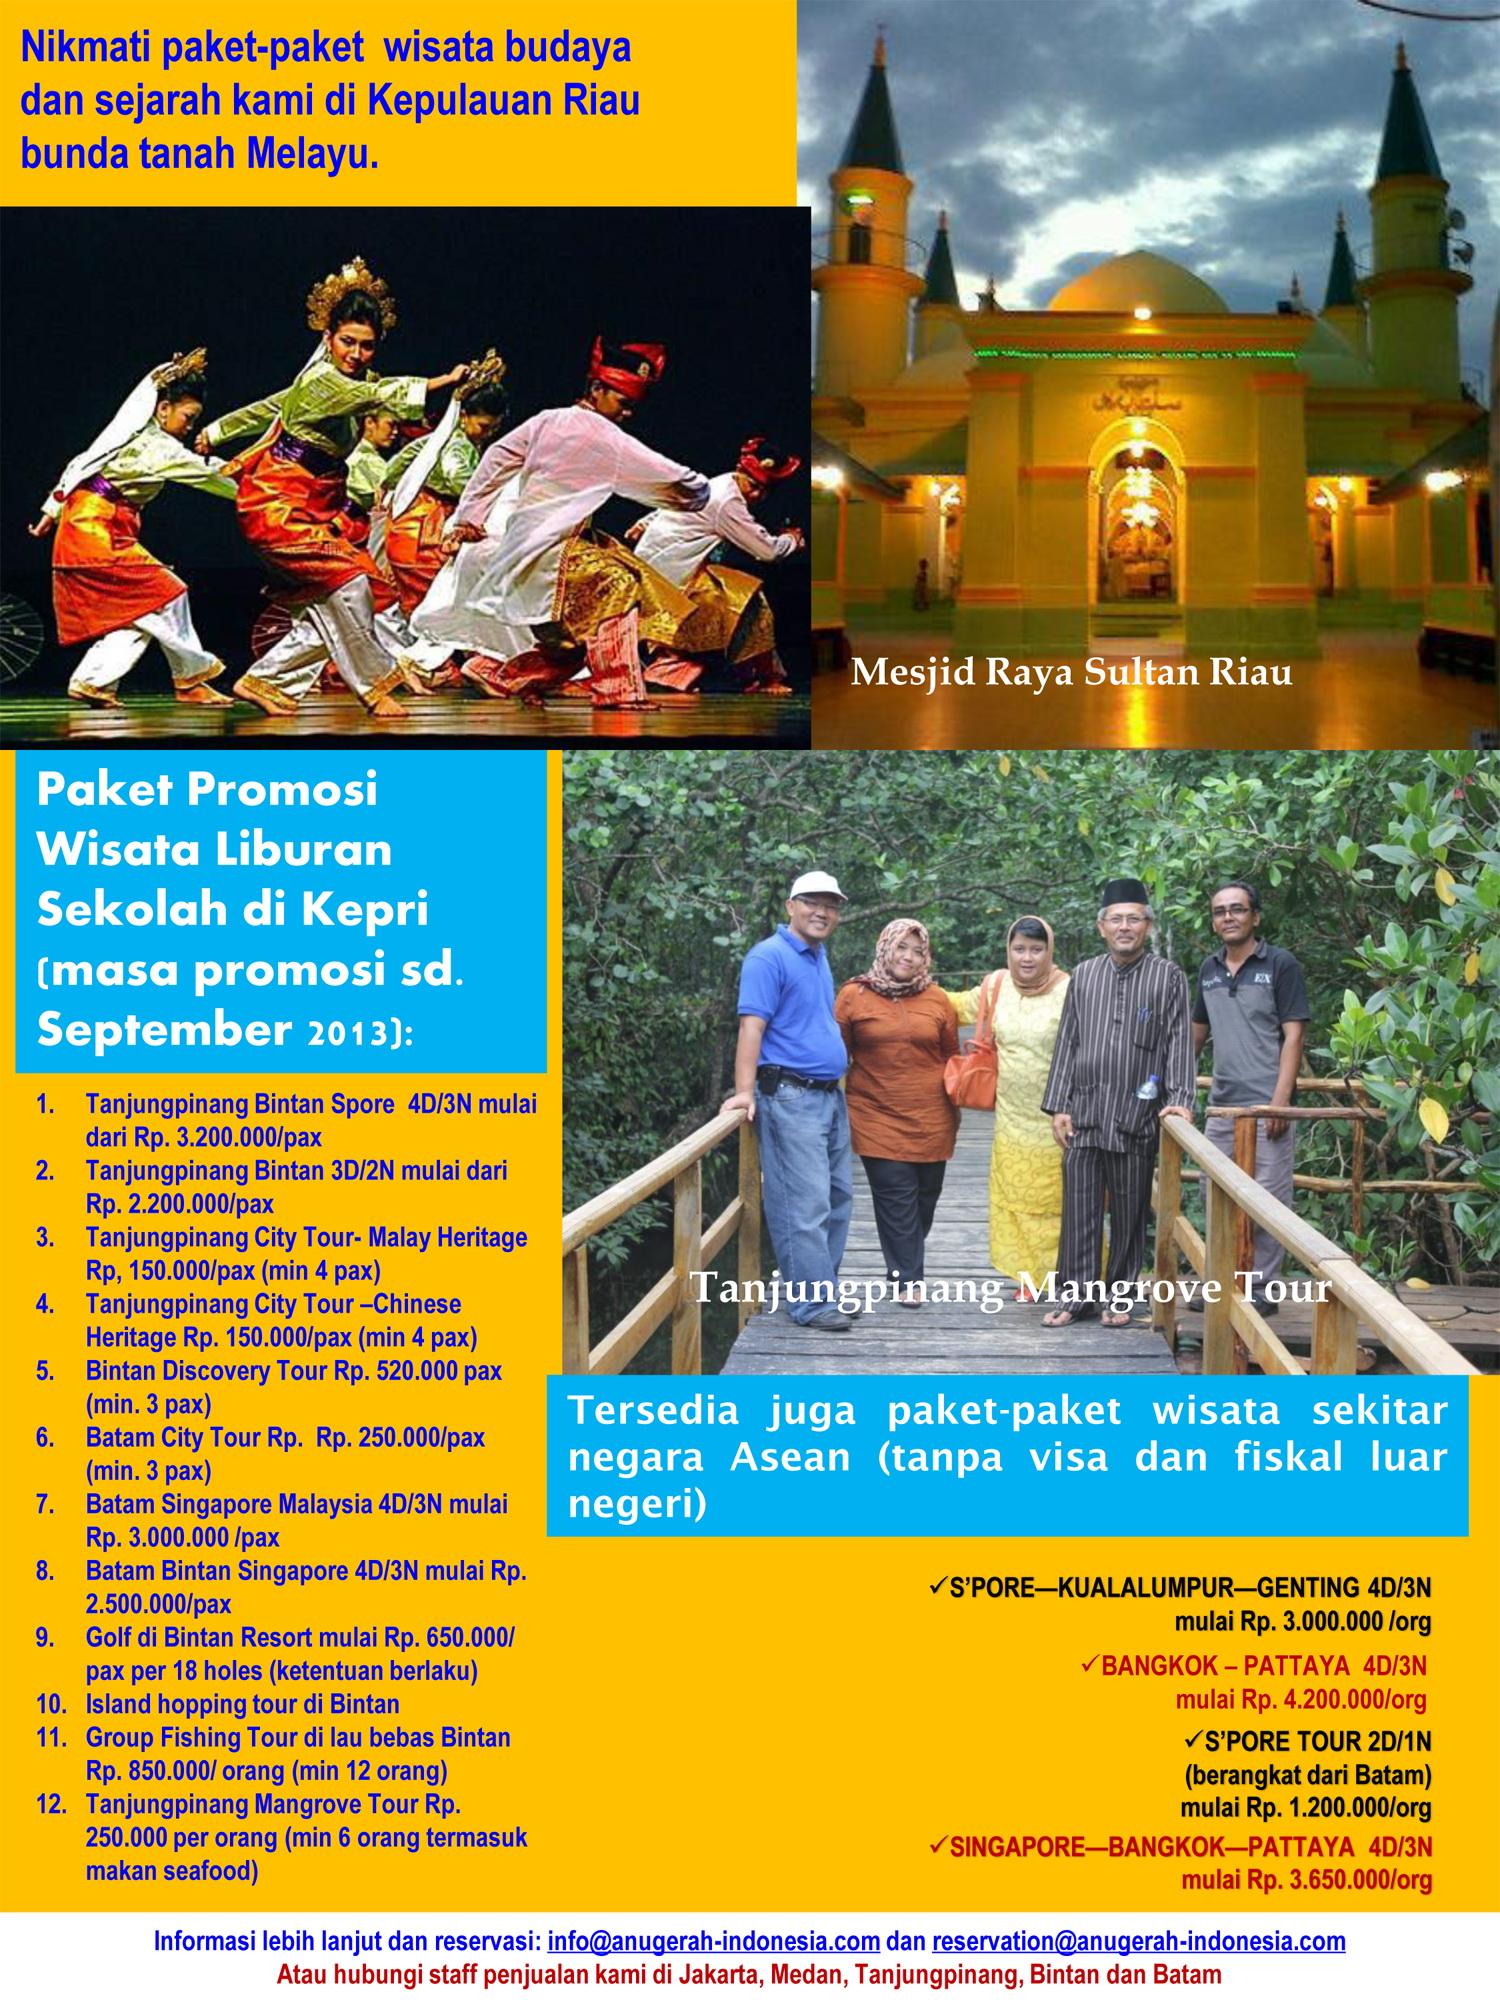 Paket Wisata Liburan Di Kepulauan Riau Anugerah Indonesia Tour 3 Negara Aitt Master Brochure Mei2013 2 1